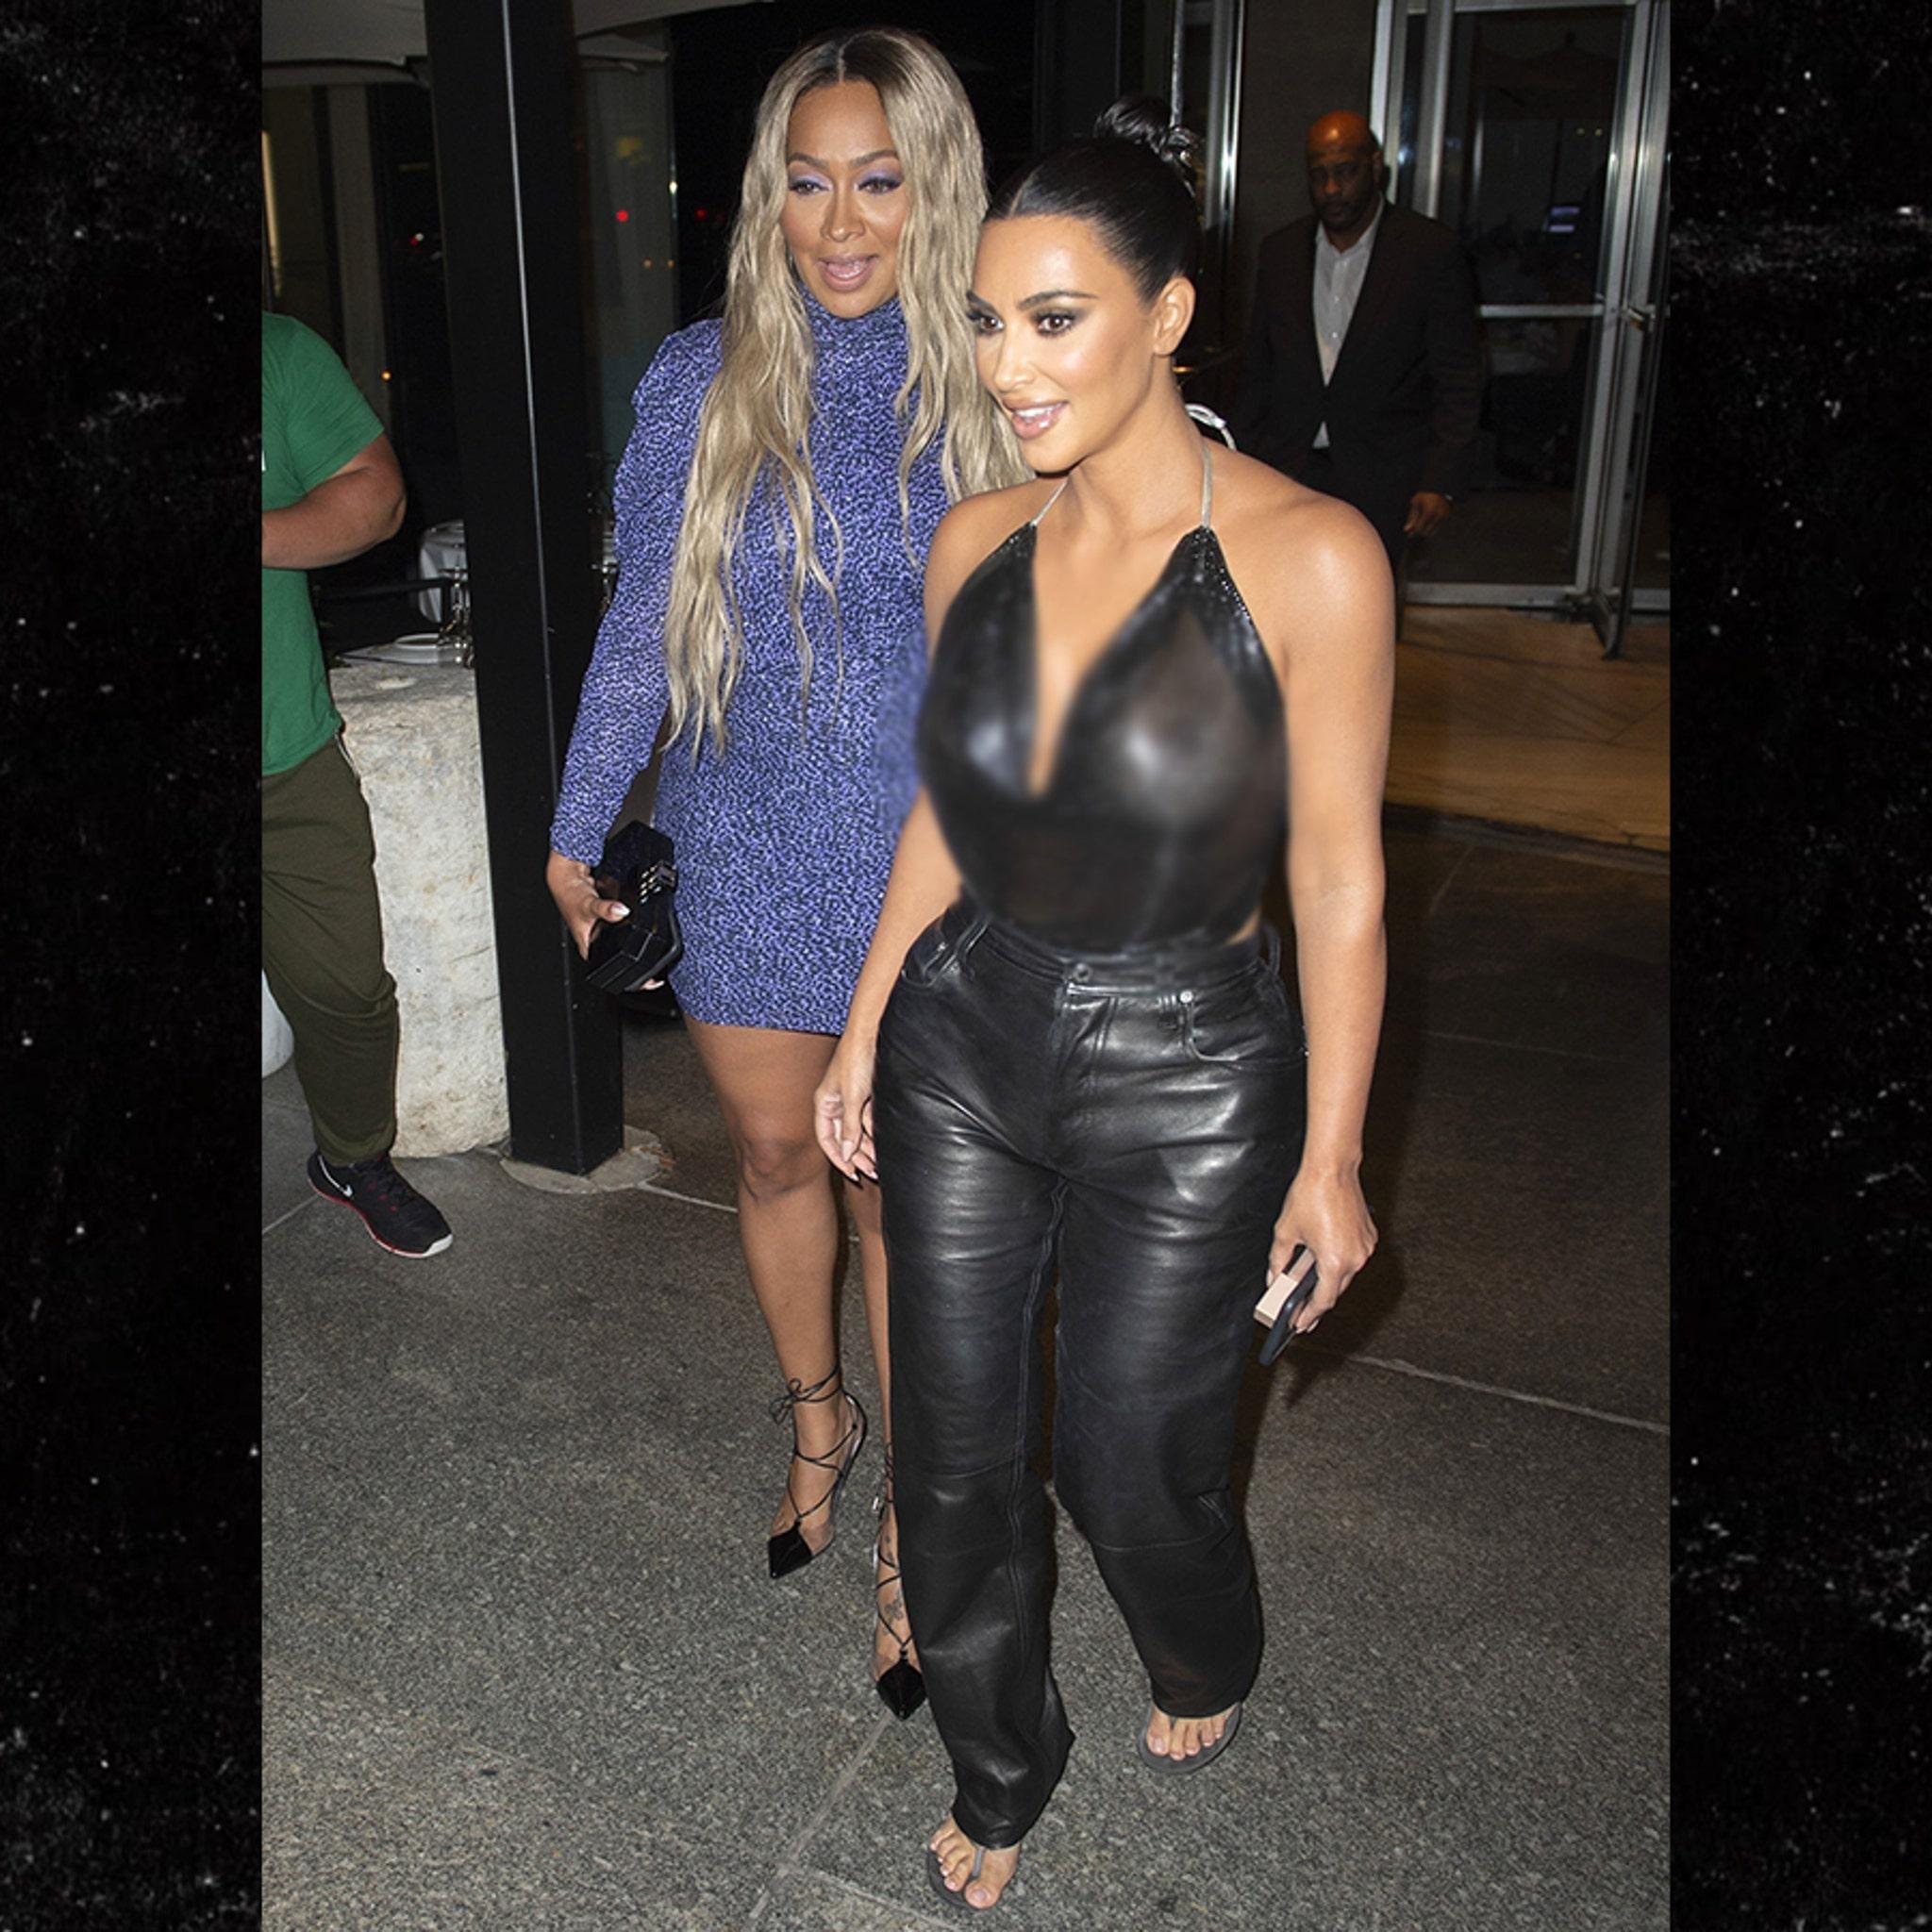 Kim Kardashian and Tristan Thompson Hit Up Same NYC Restaurant